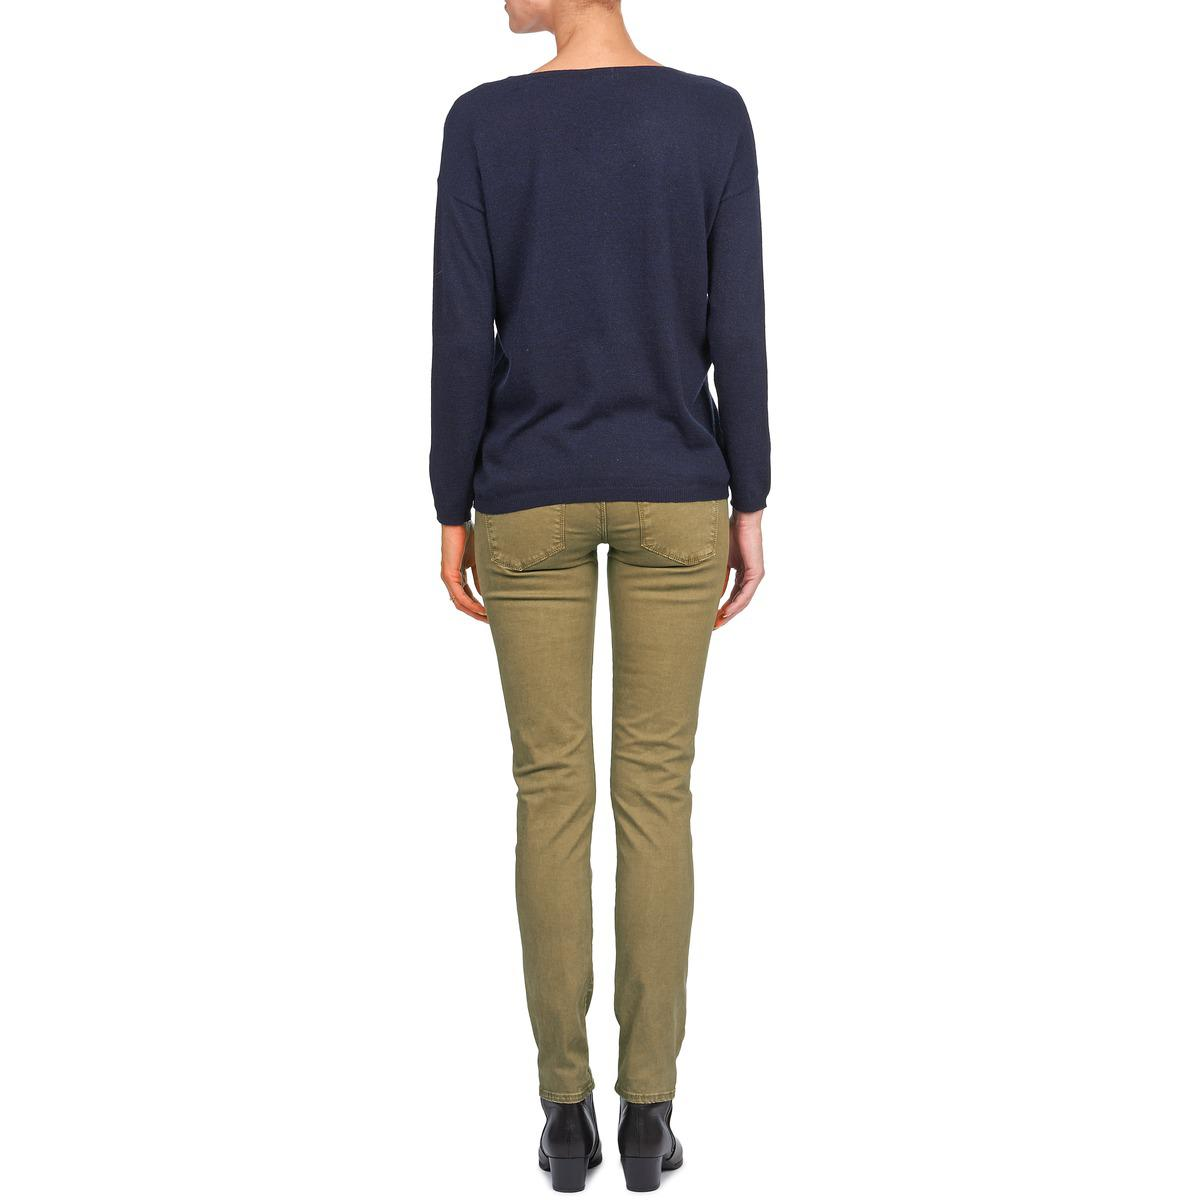 Acquaverde Denim Joe Women's Skinny Jeans In Brown